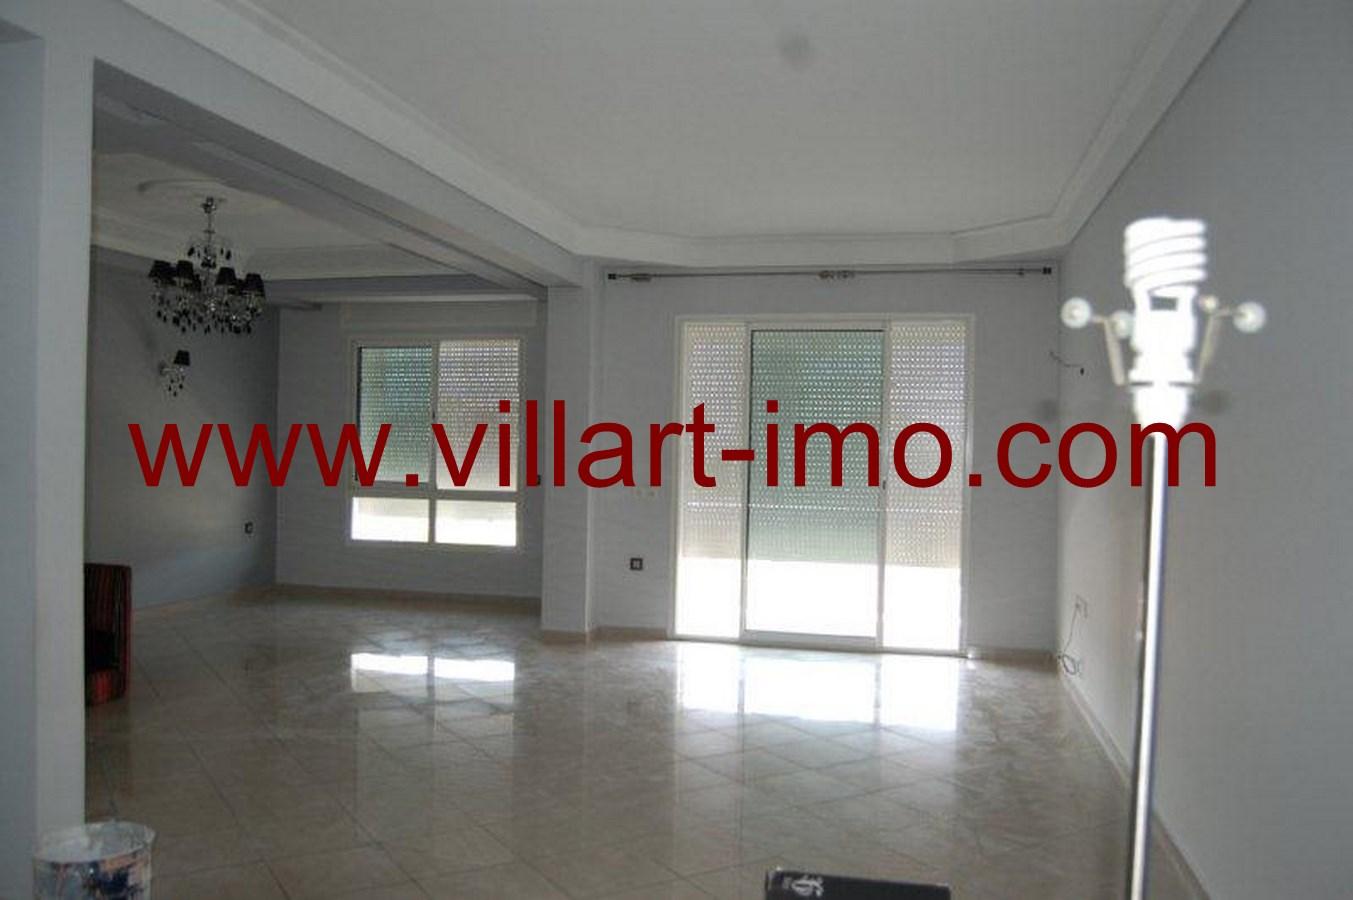 2-Location-Appartement-Non meublé-Tanger-Iberia-Salon'-L484-Villart immo